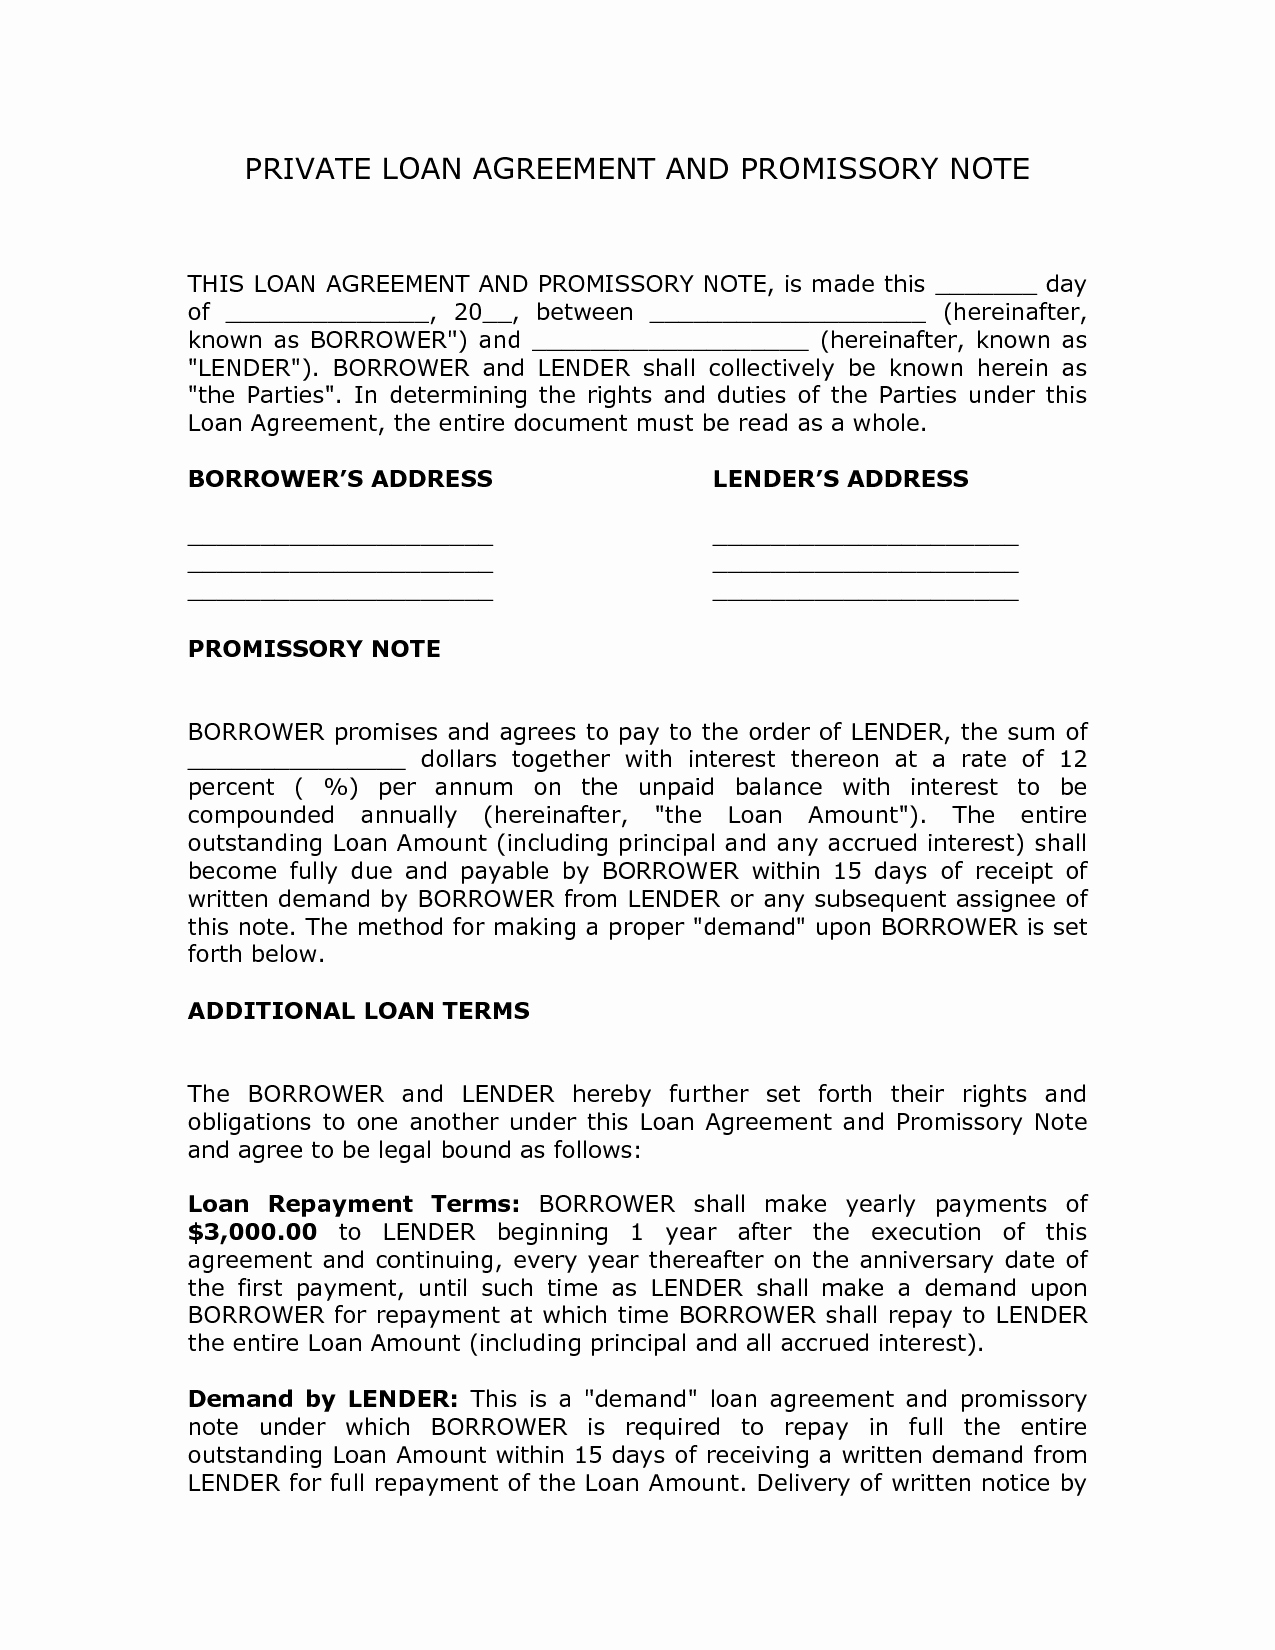 Loan Document Template Free Beautiful Private Loan Agreement Template Free Free Printable